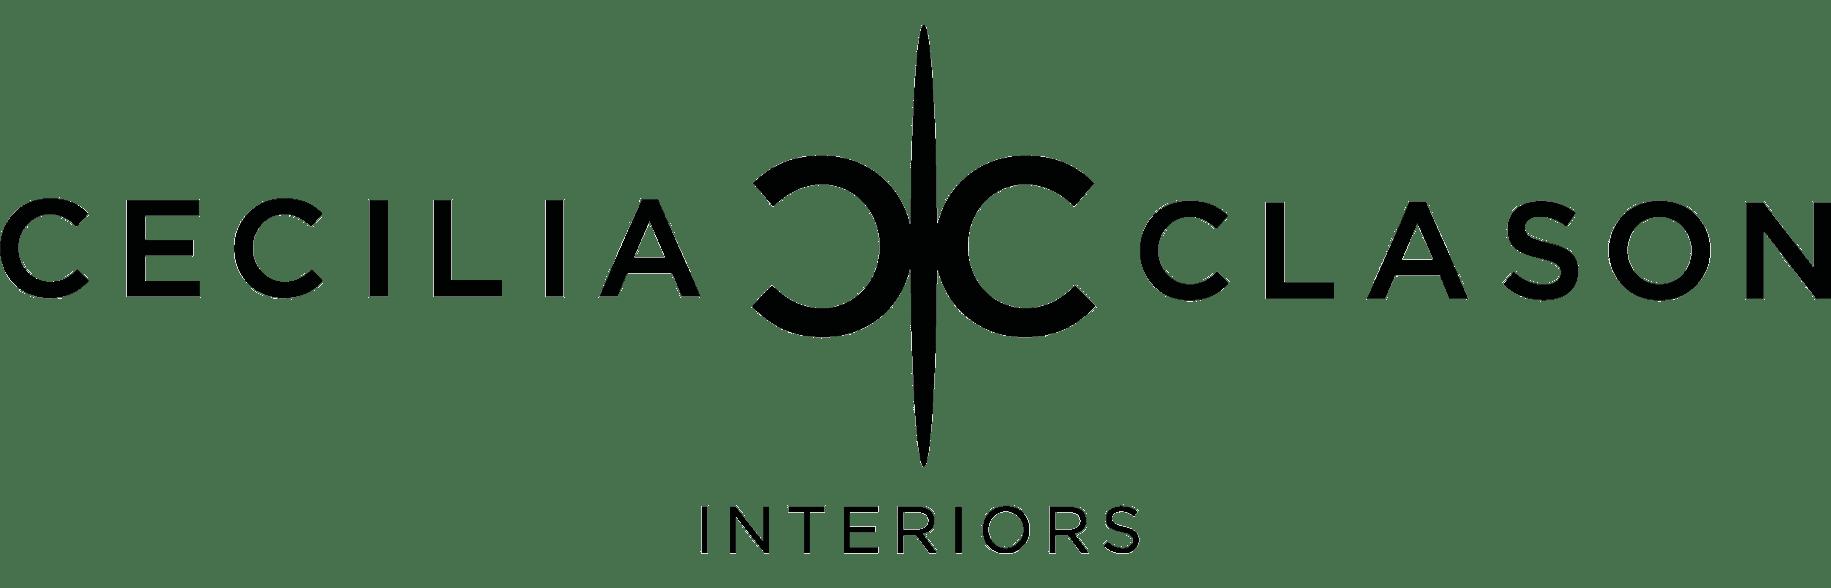 Interior Designer Dubai | Cecilia Clason Interiors